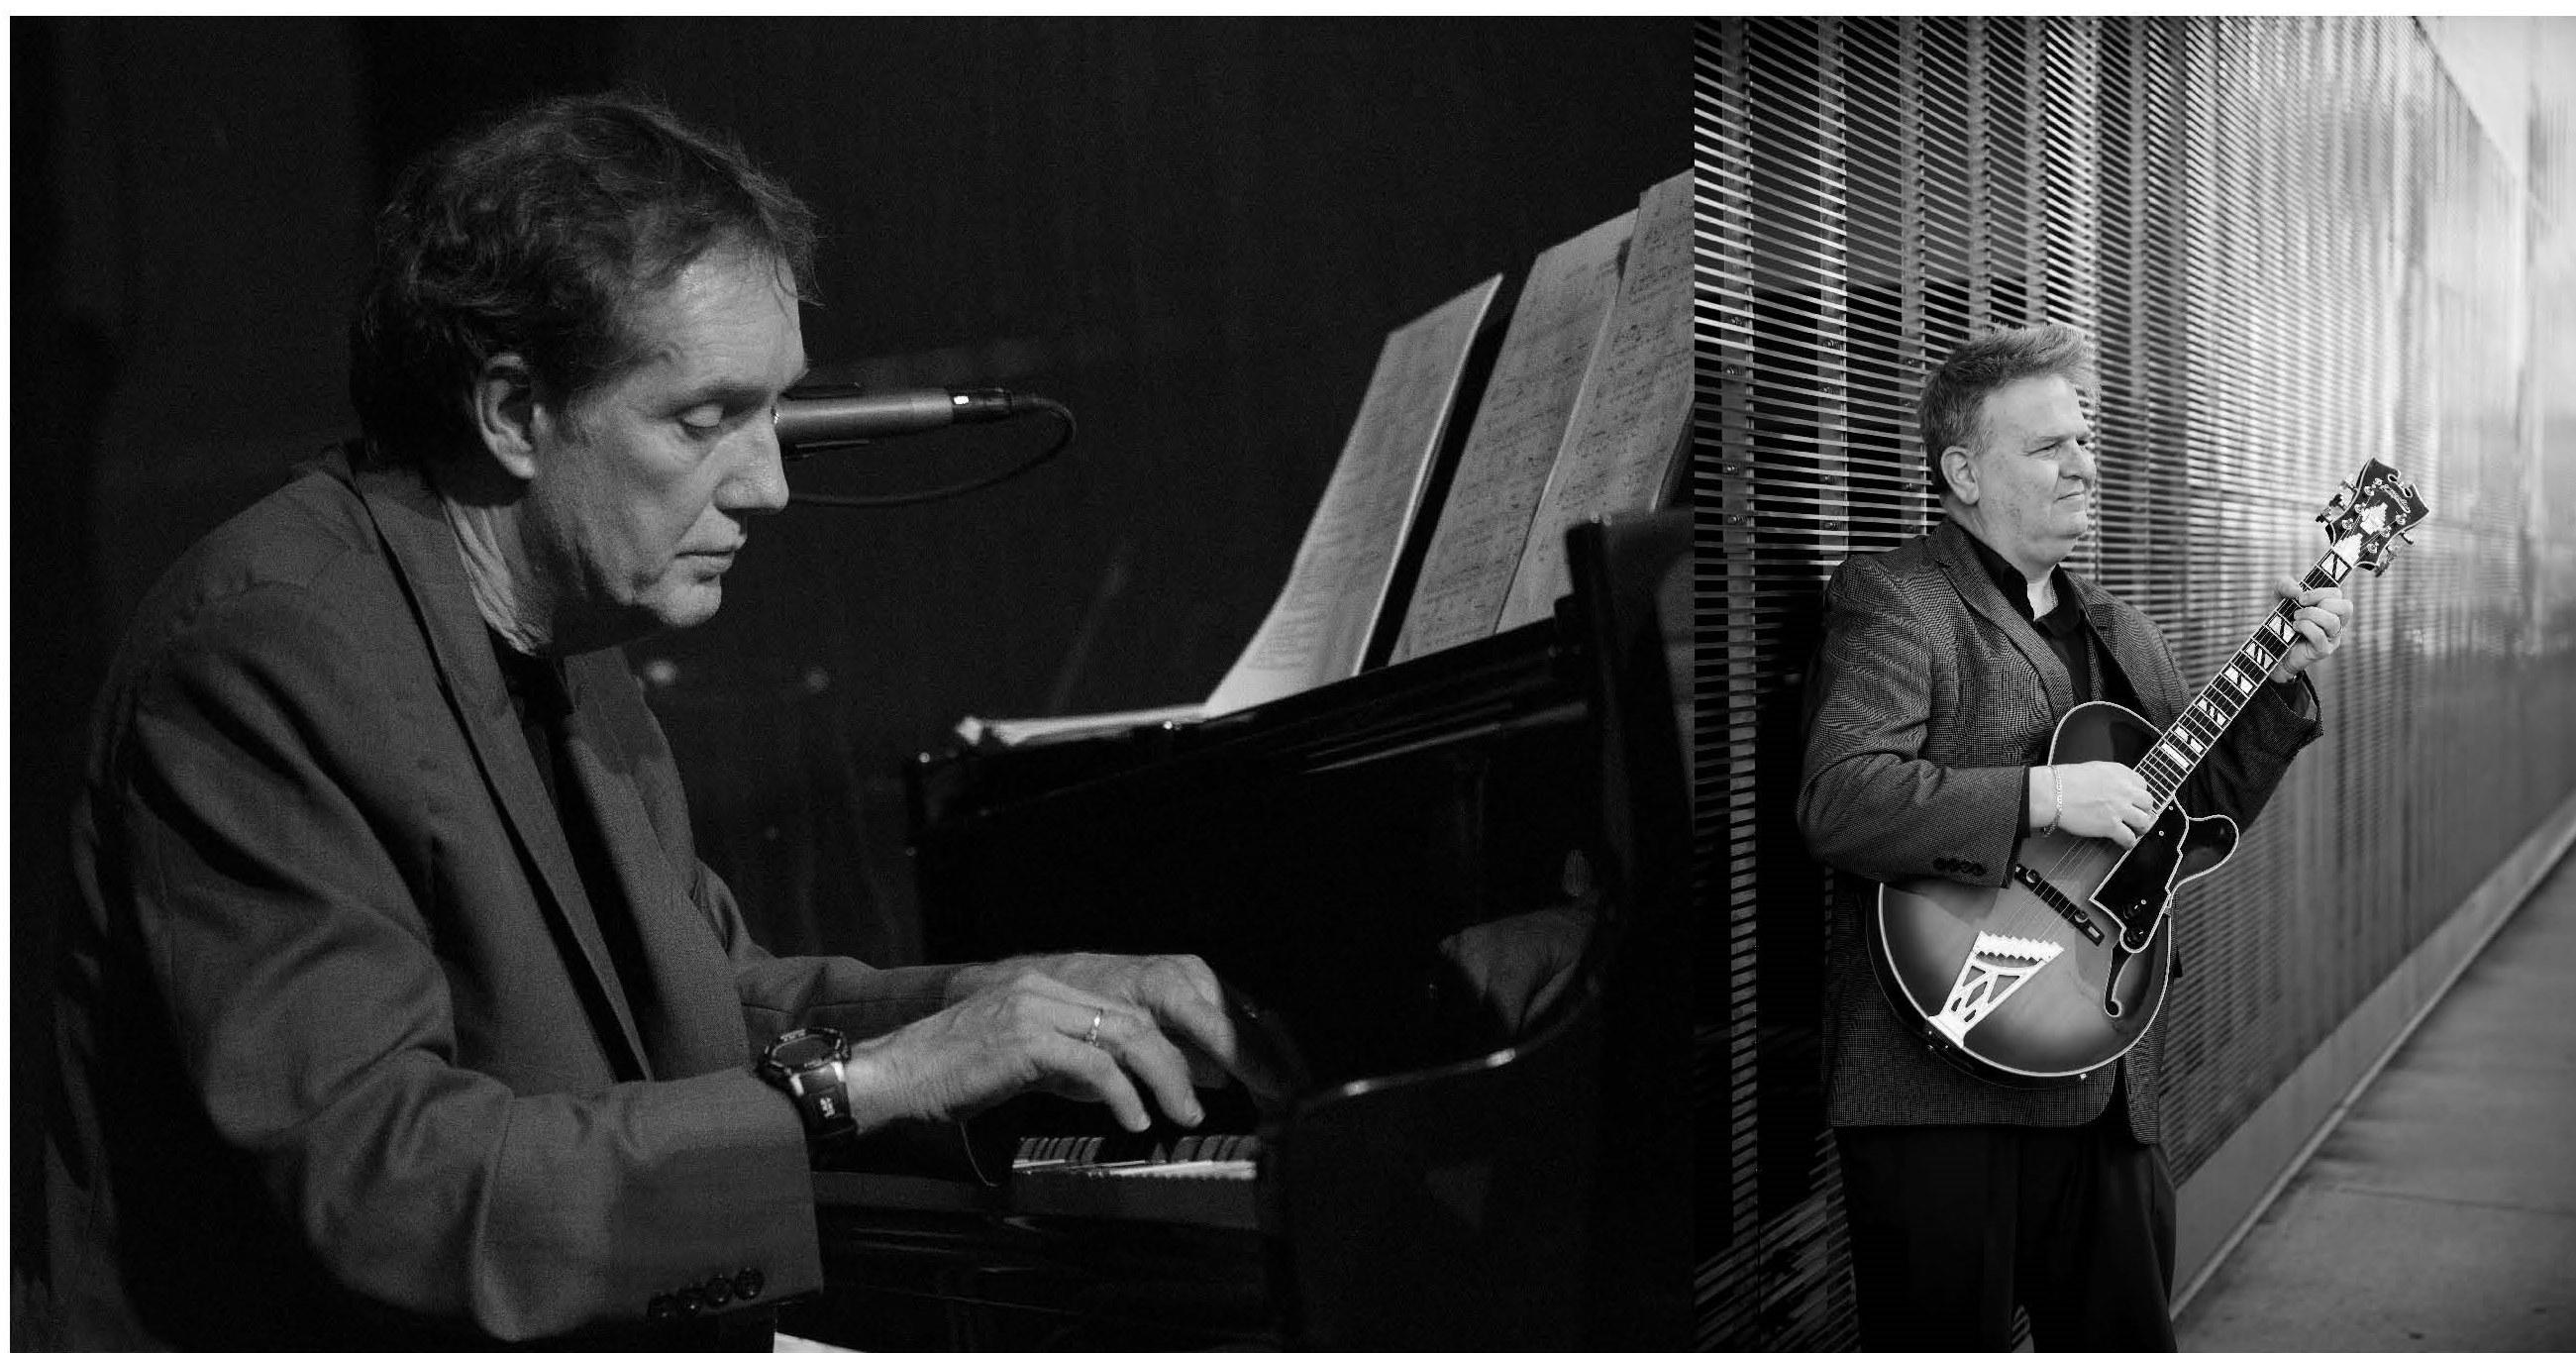 Live From Studio 1: Joel Shapira & Larry McDonough